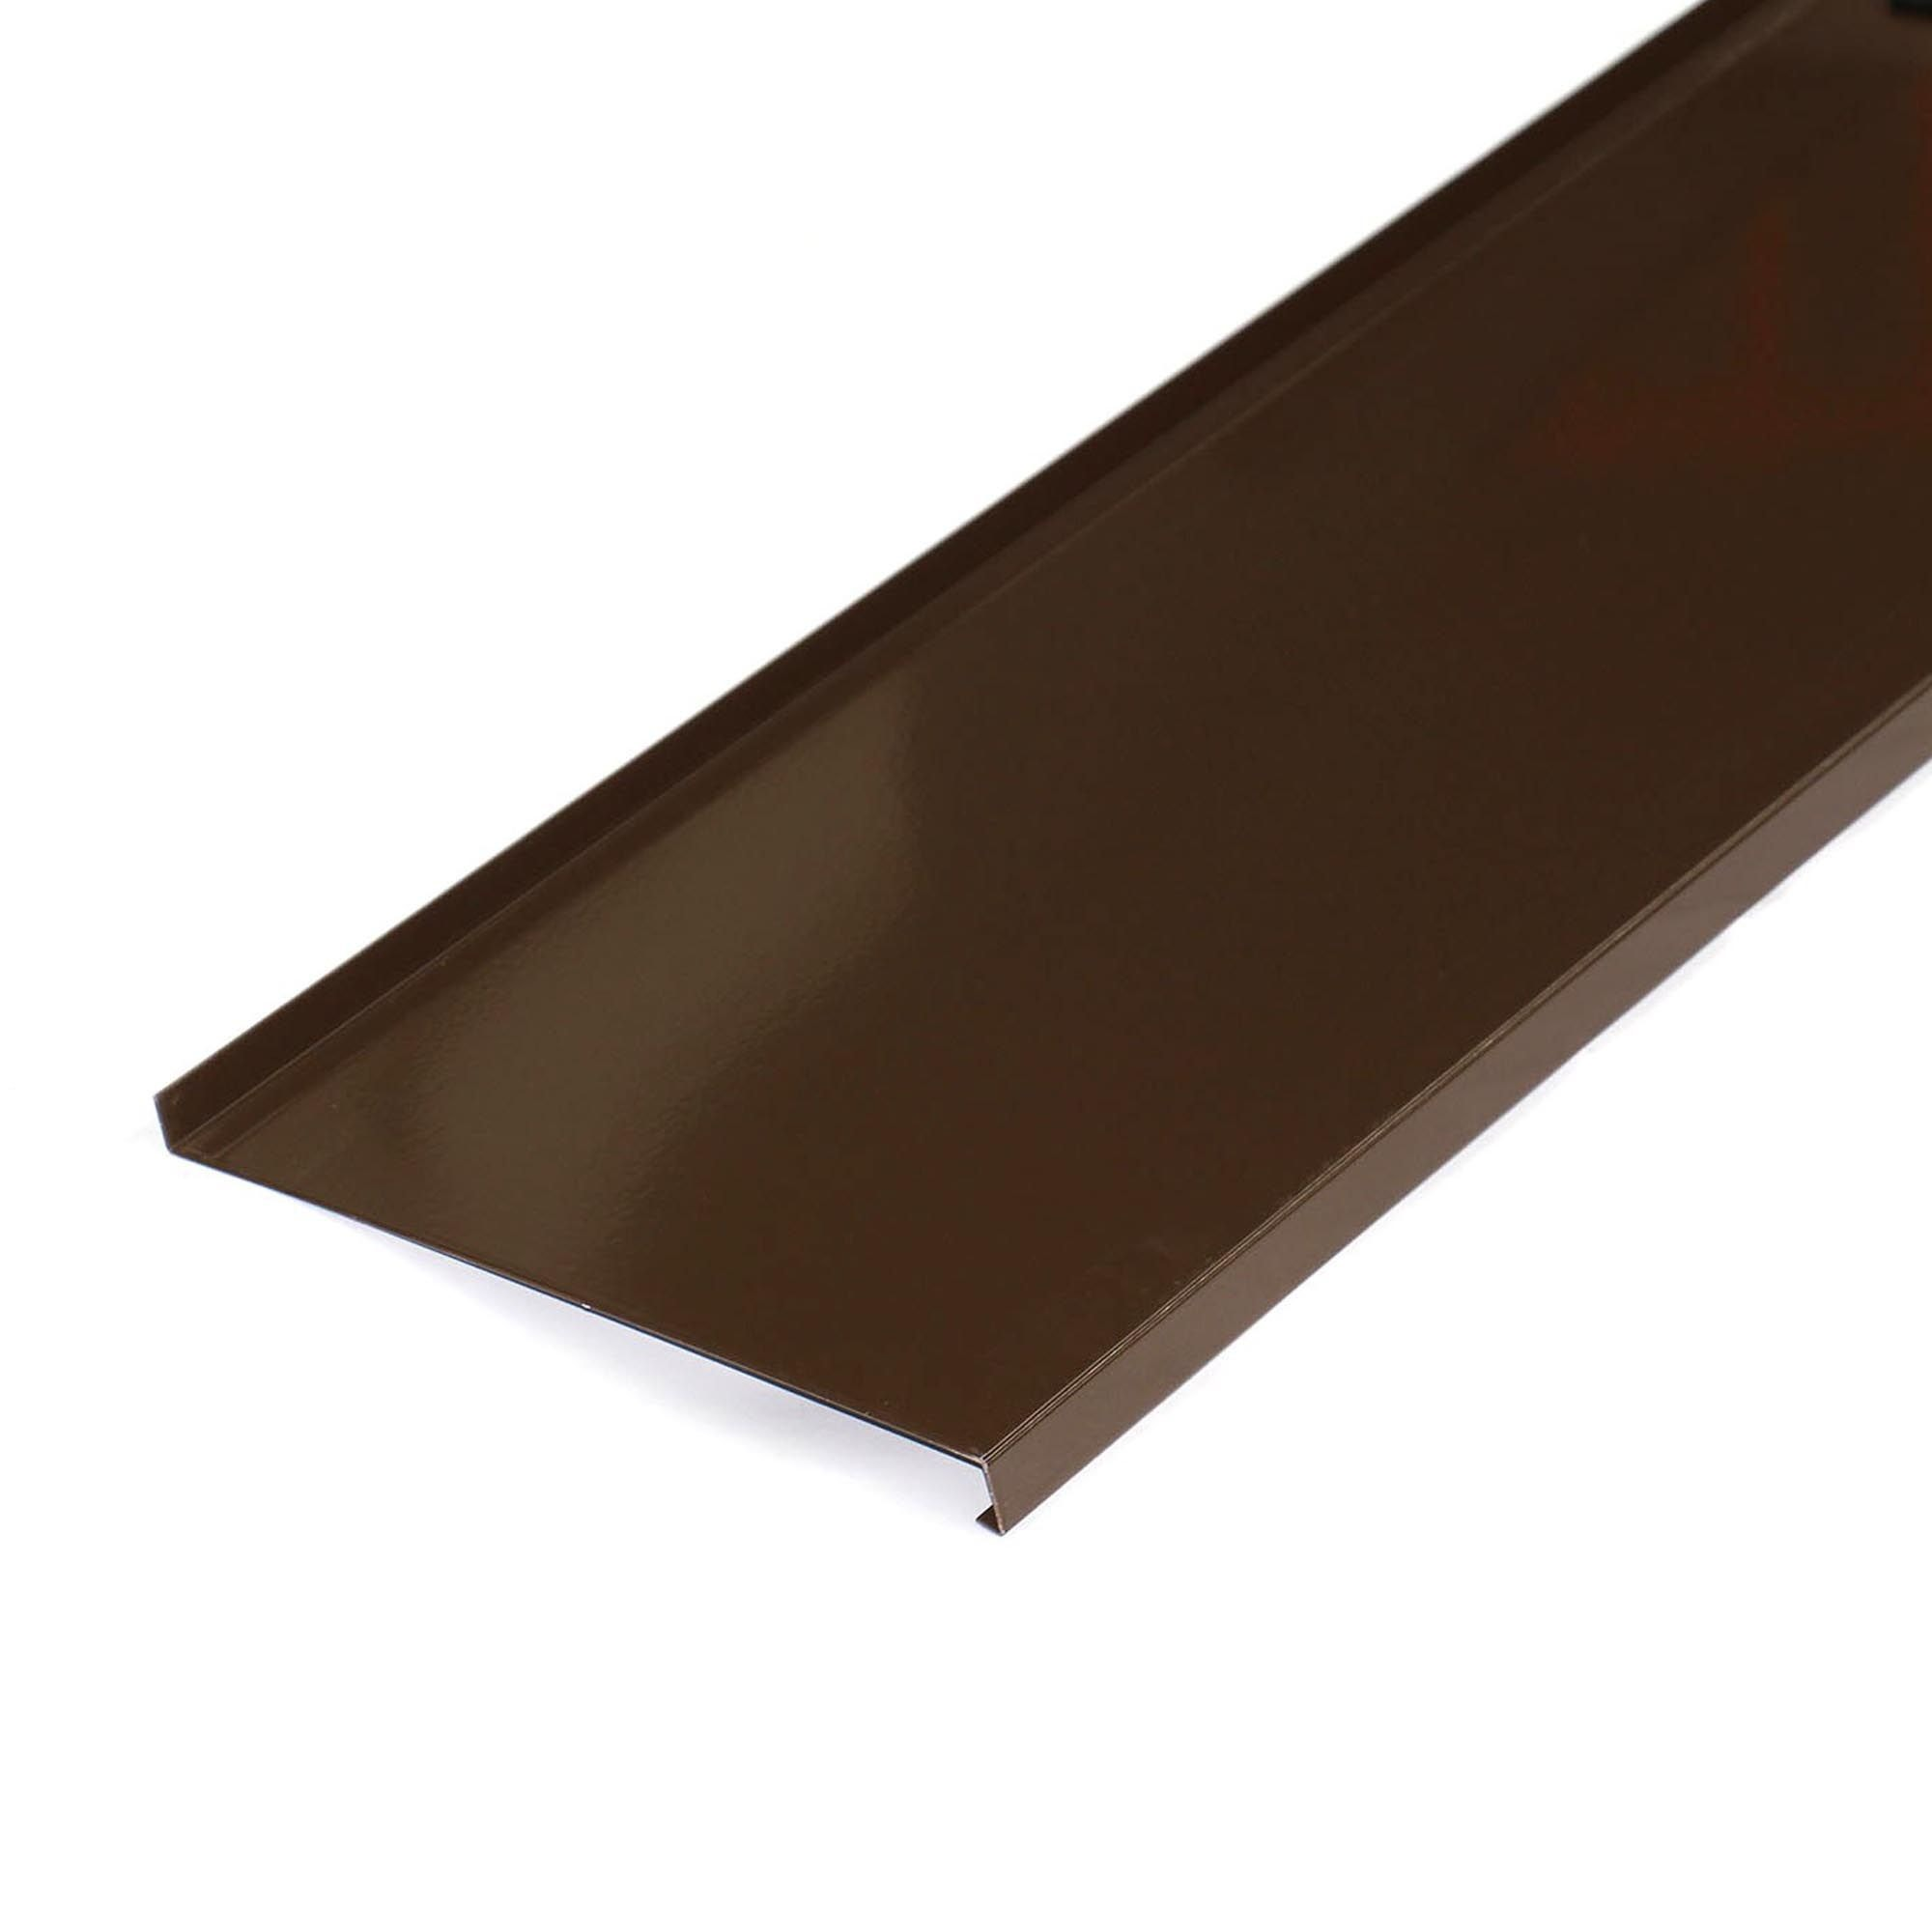 Glaf din aluminiu, maro ciocolatiu mat RAL 8017, 300 x 18 cm imagine MatHaus.ro